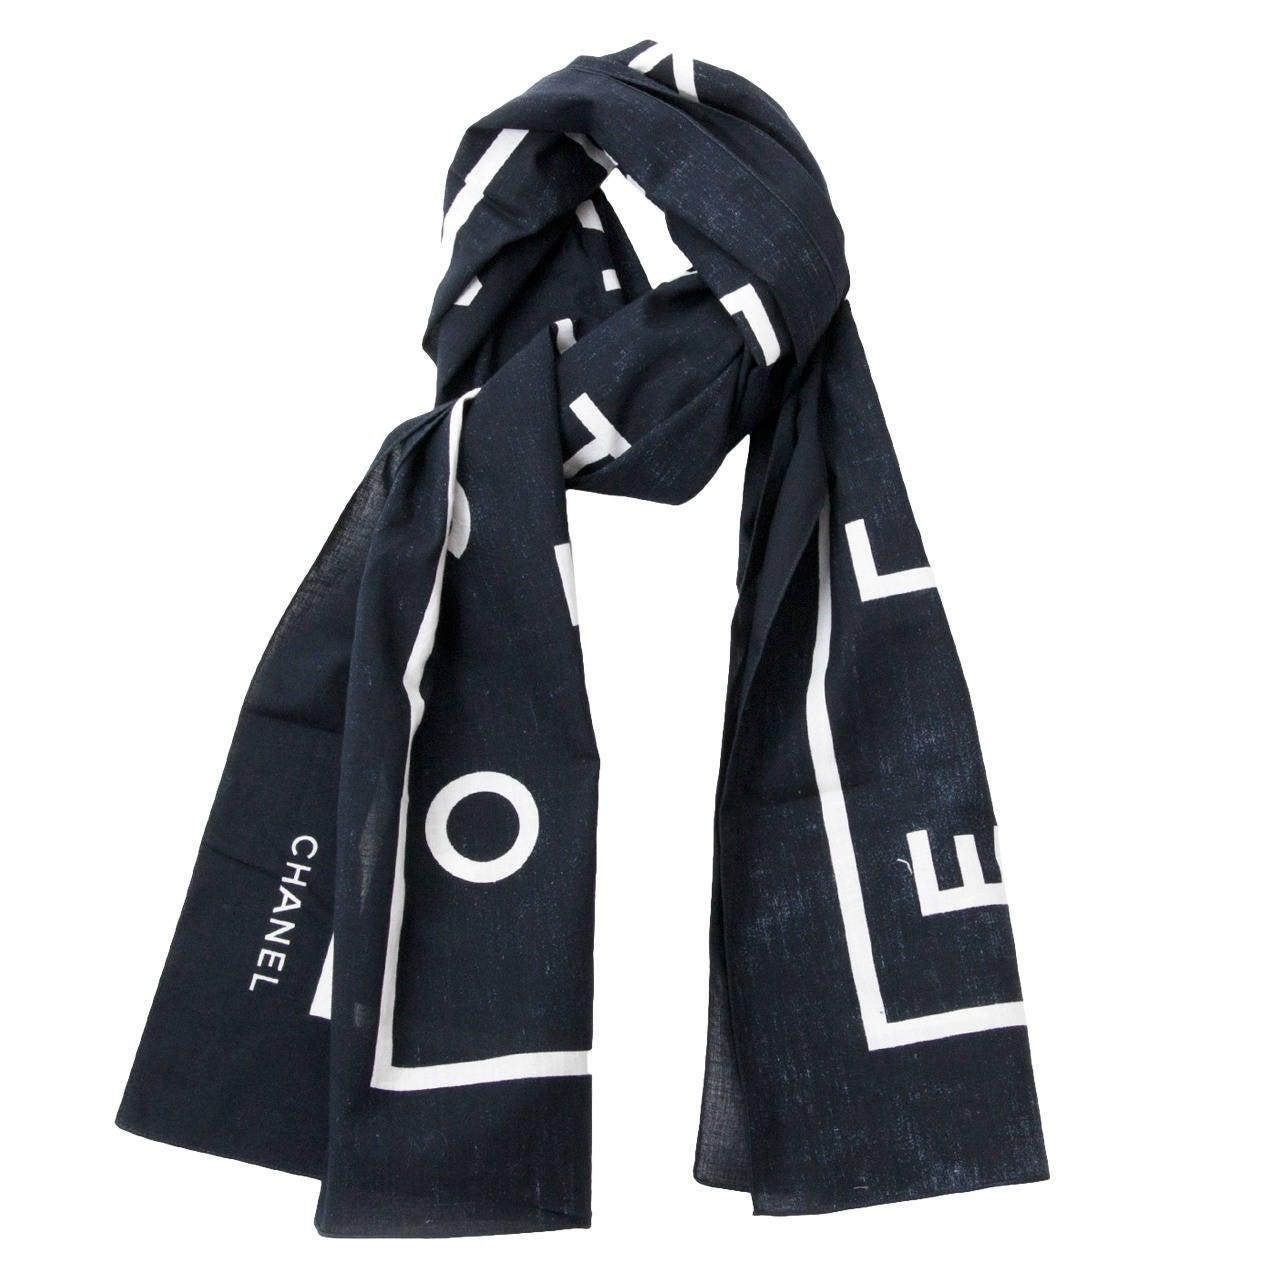 chanel black letter scarf at 1stdibs